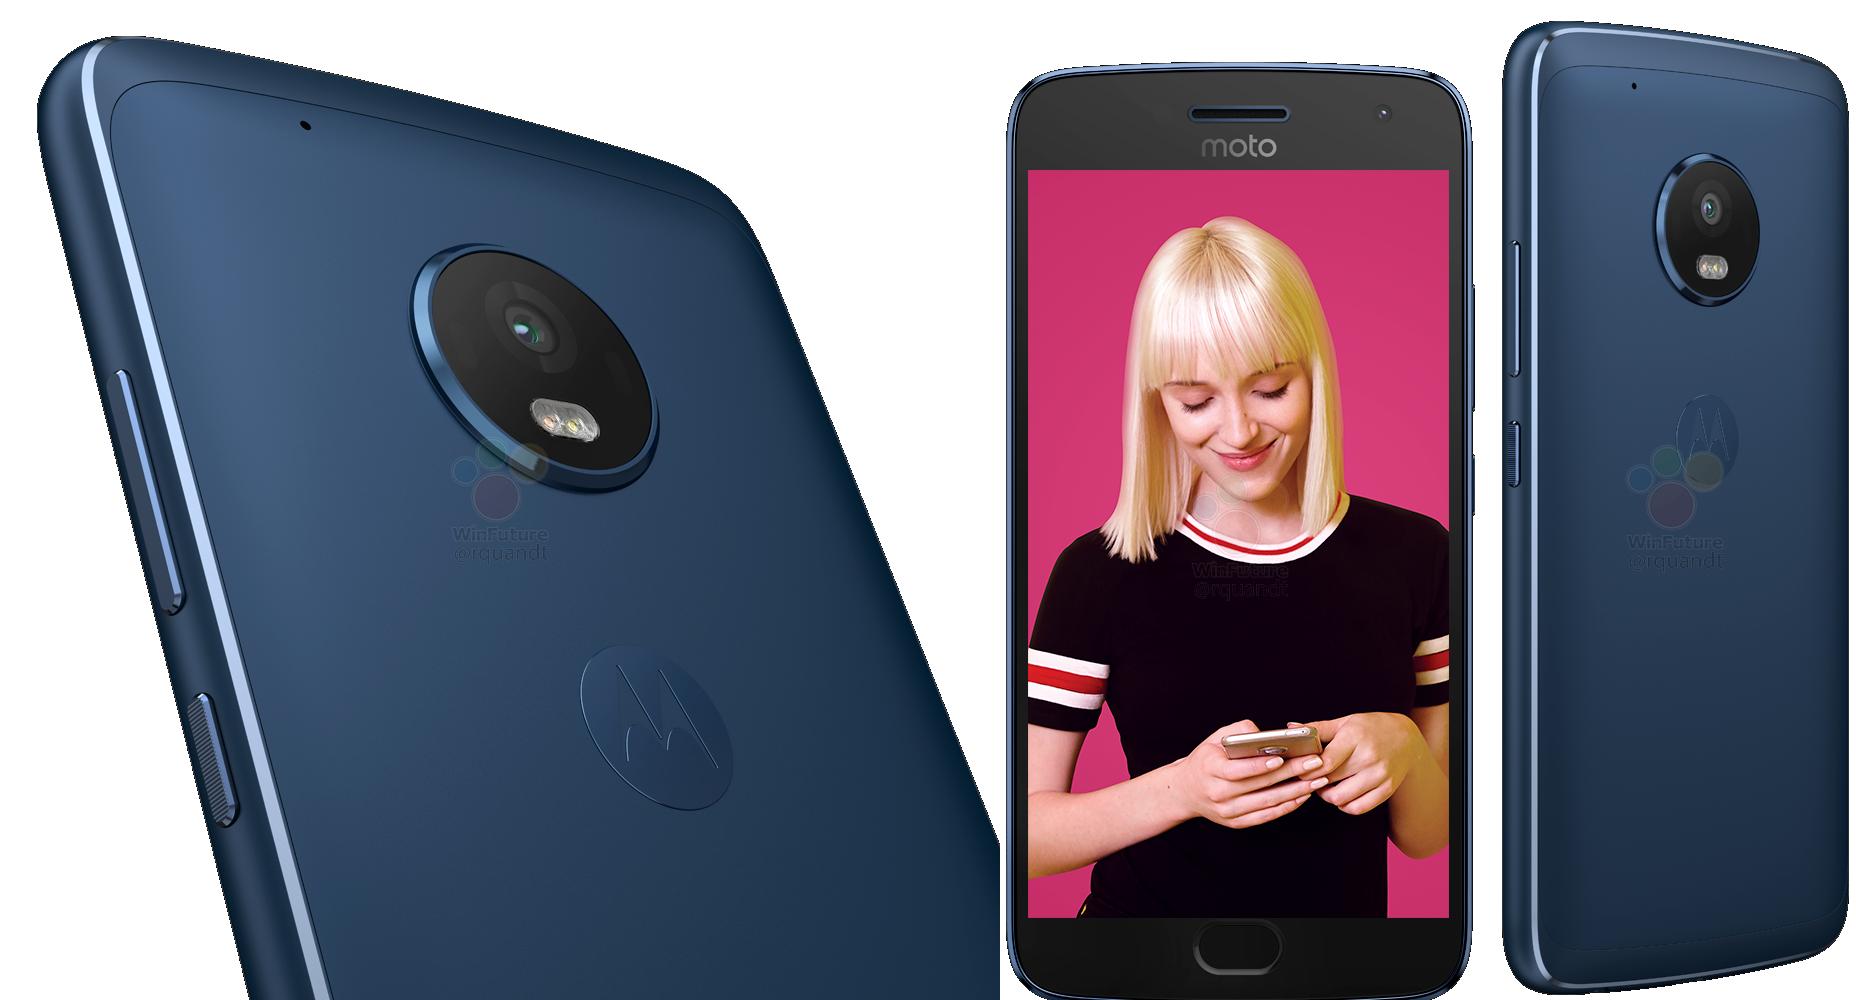 Así luce el nuevo Moto G5 Plus